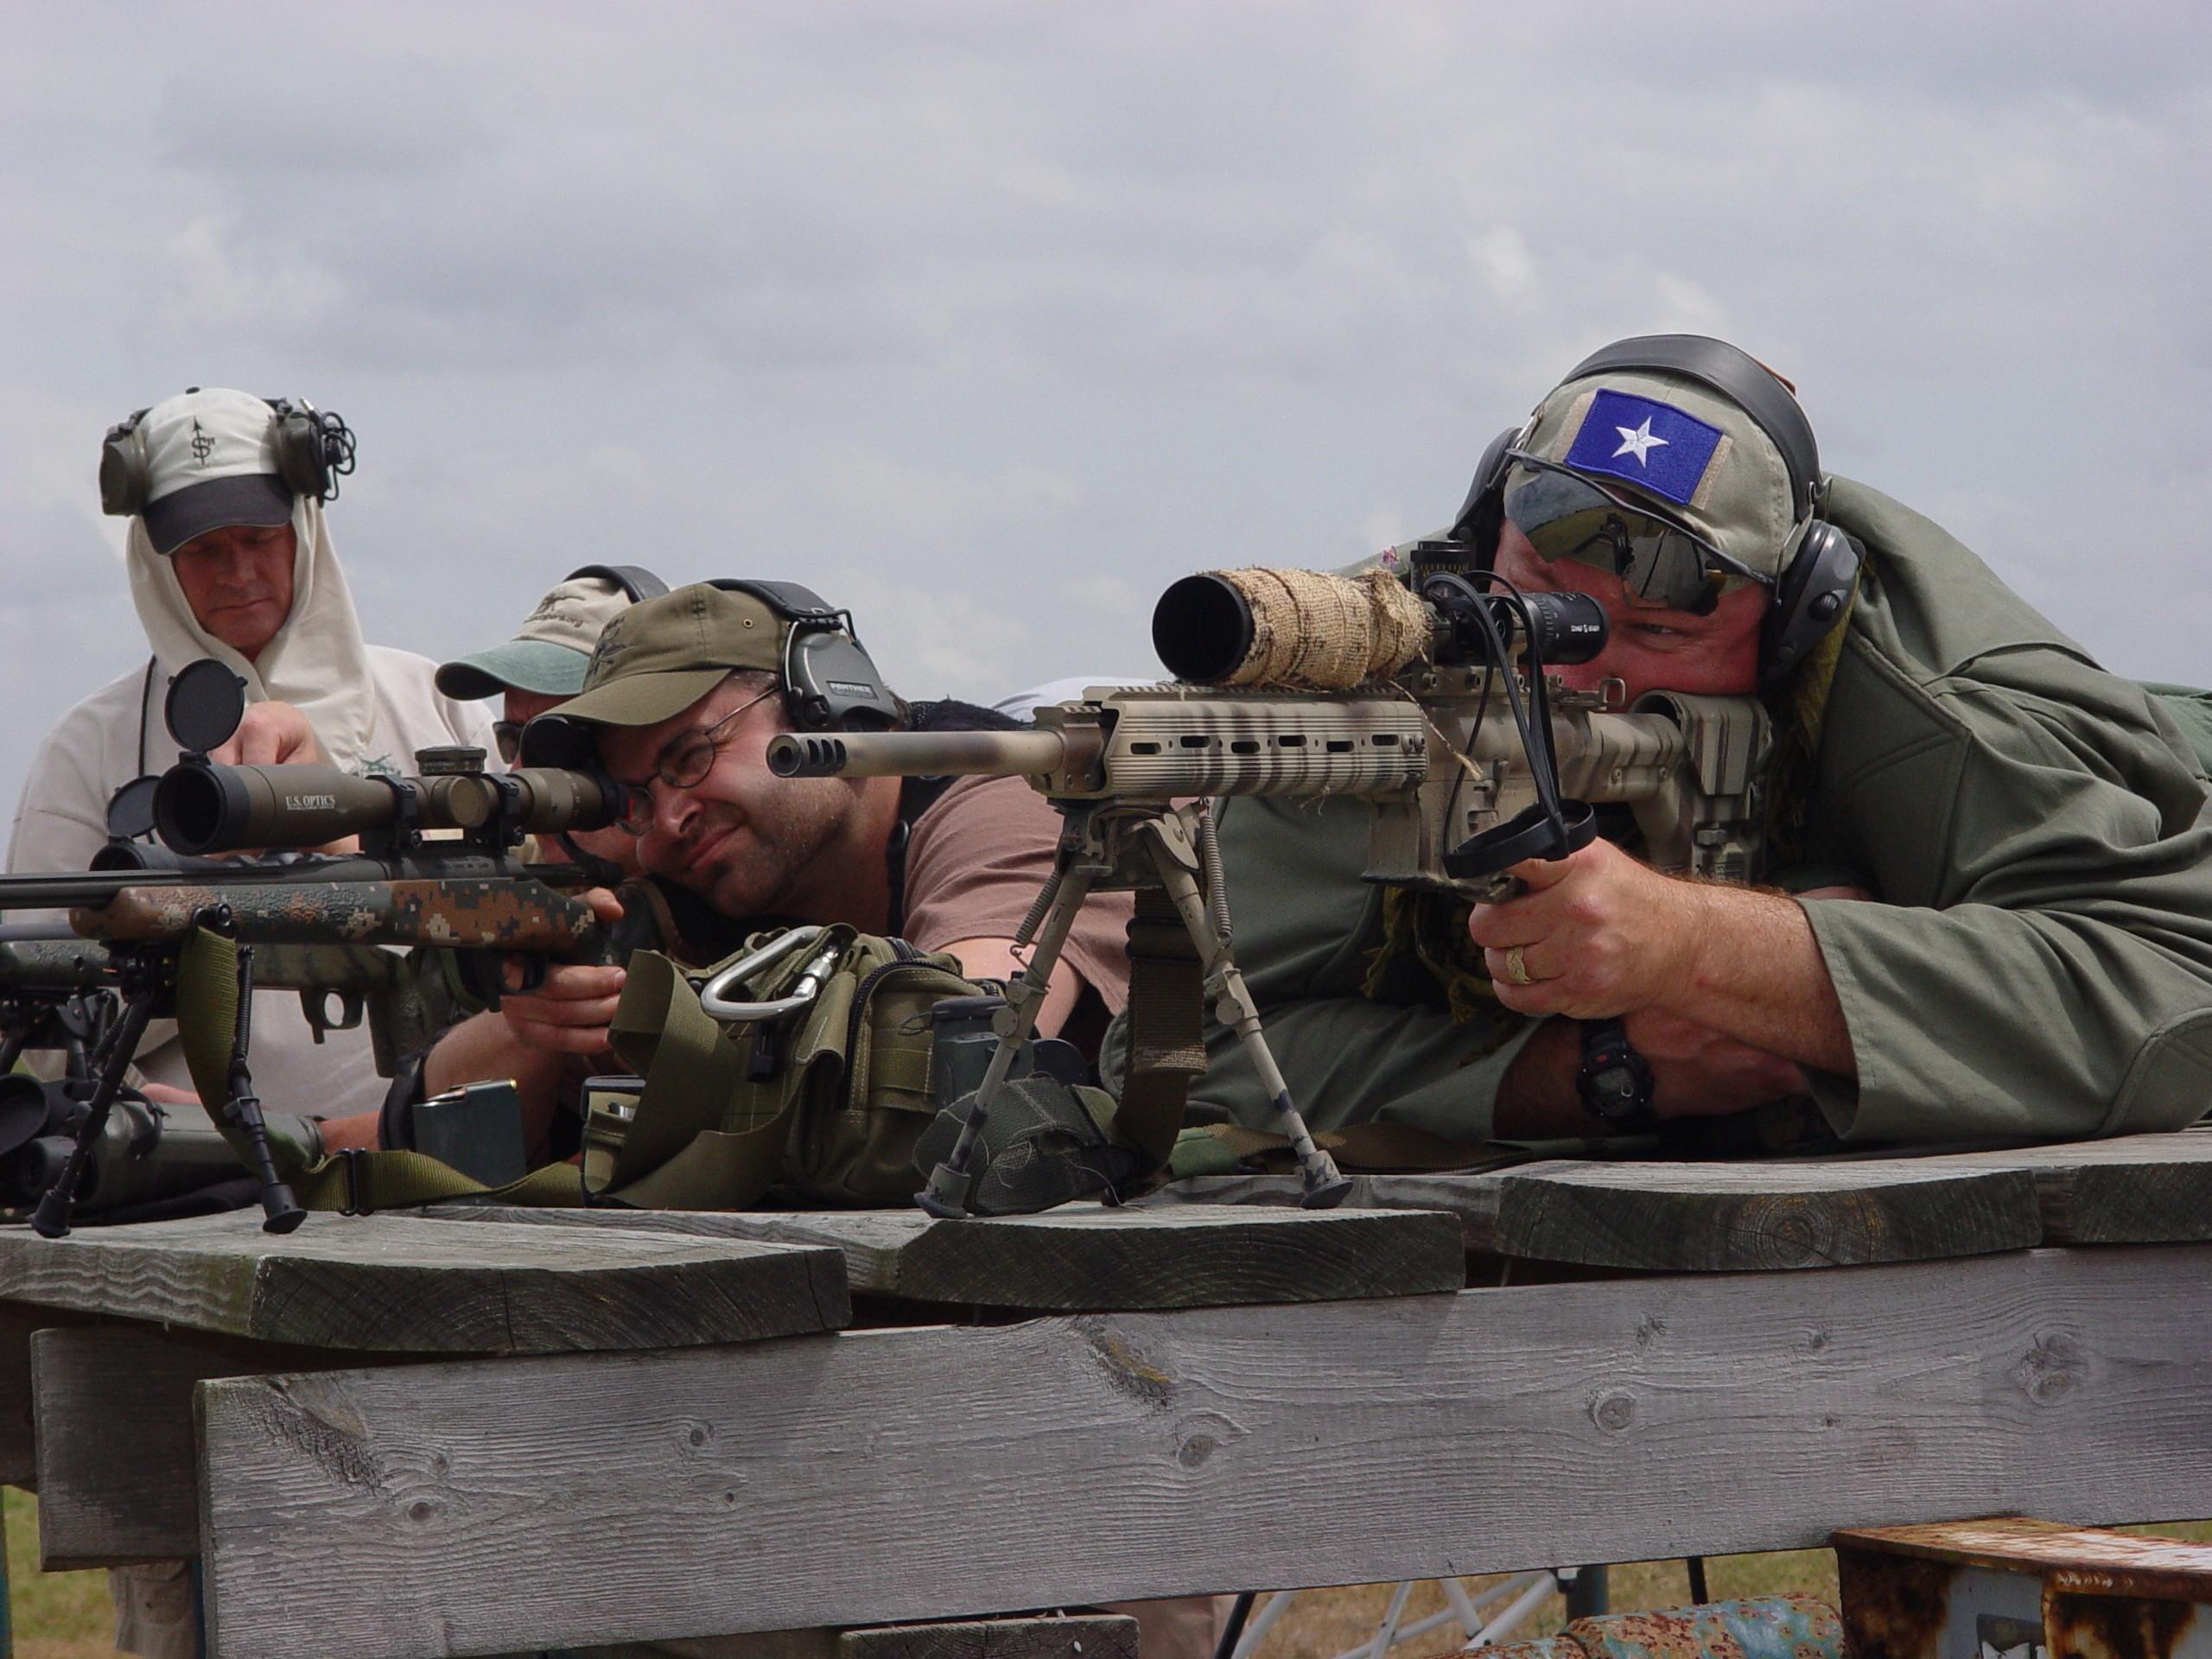 Snipers Hide Cup